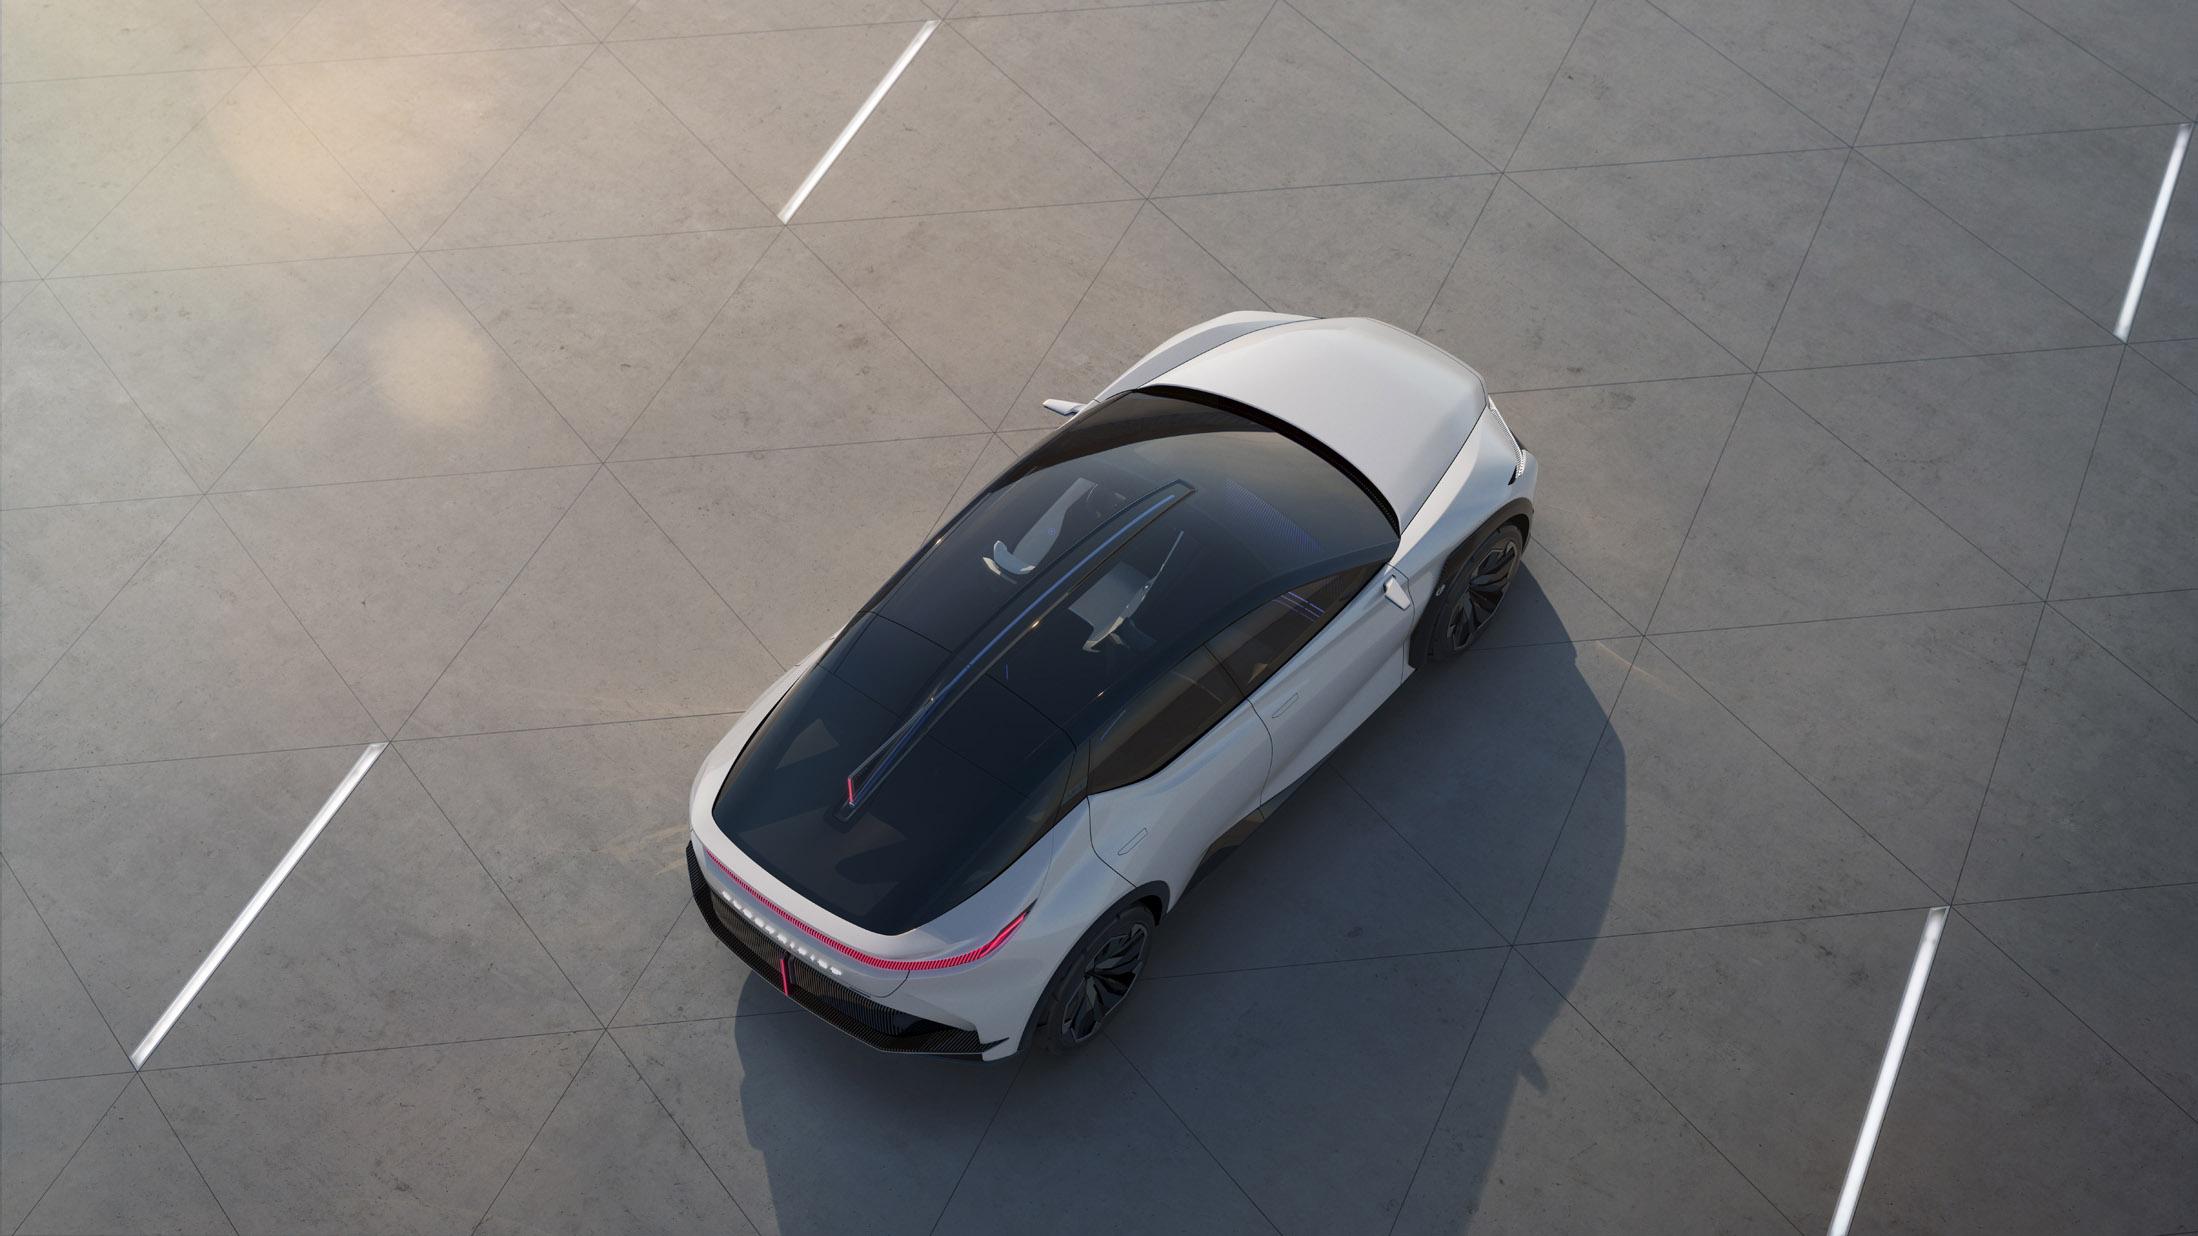 05-Lexus-LF-Z-Electrified